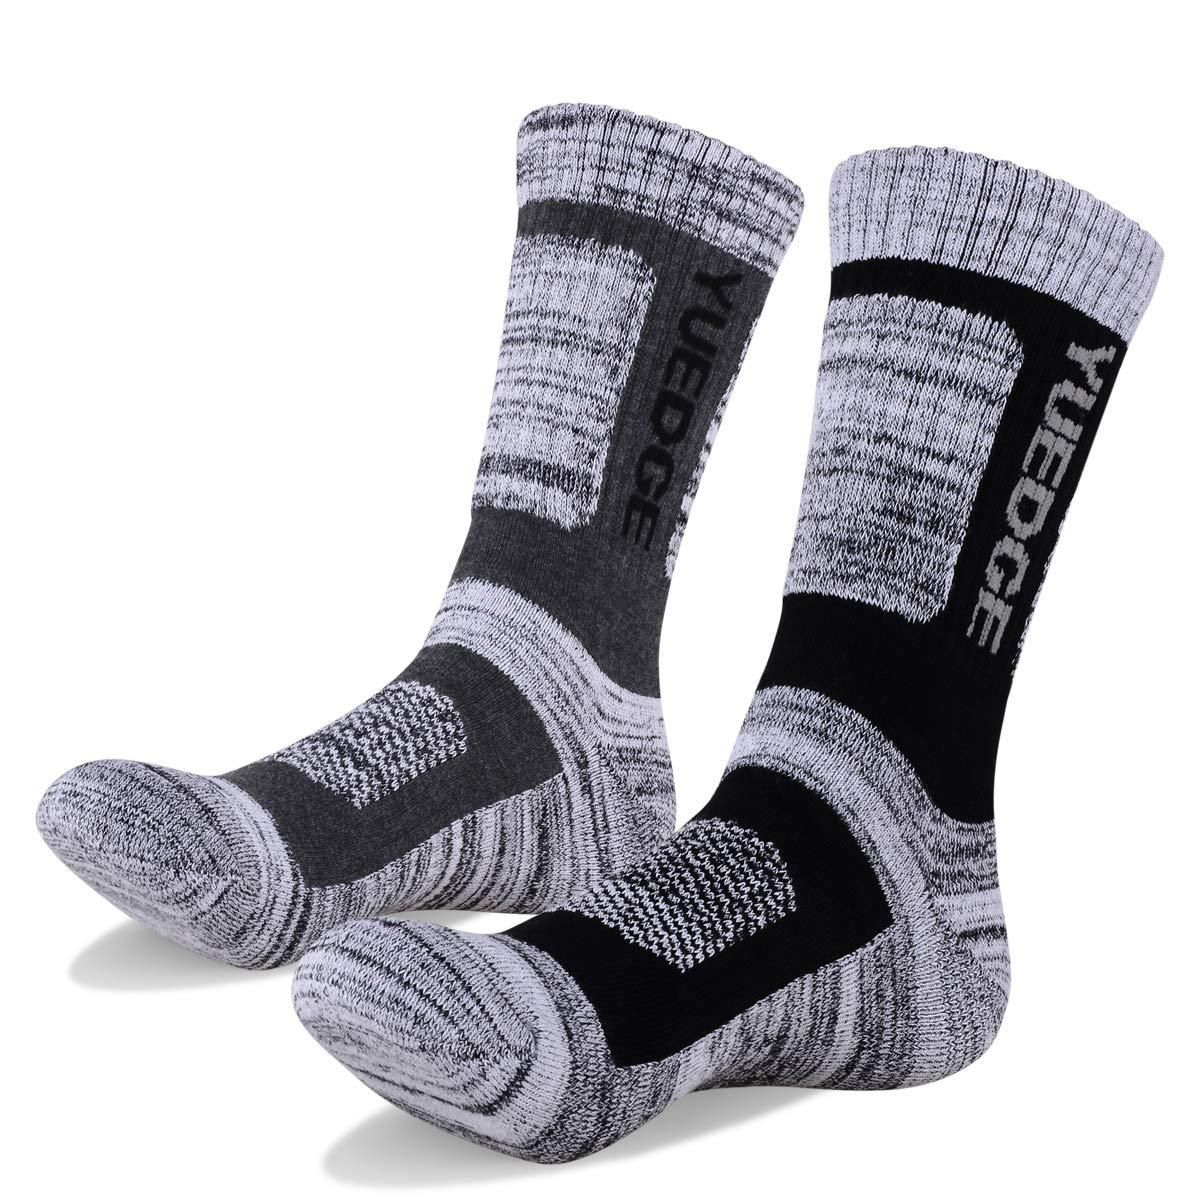 YUEDGE 5 Pair Pack Mens Crew Socks Combed Cotton Wicking Cushion Dress Socks